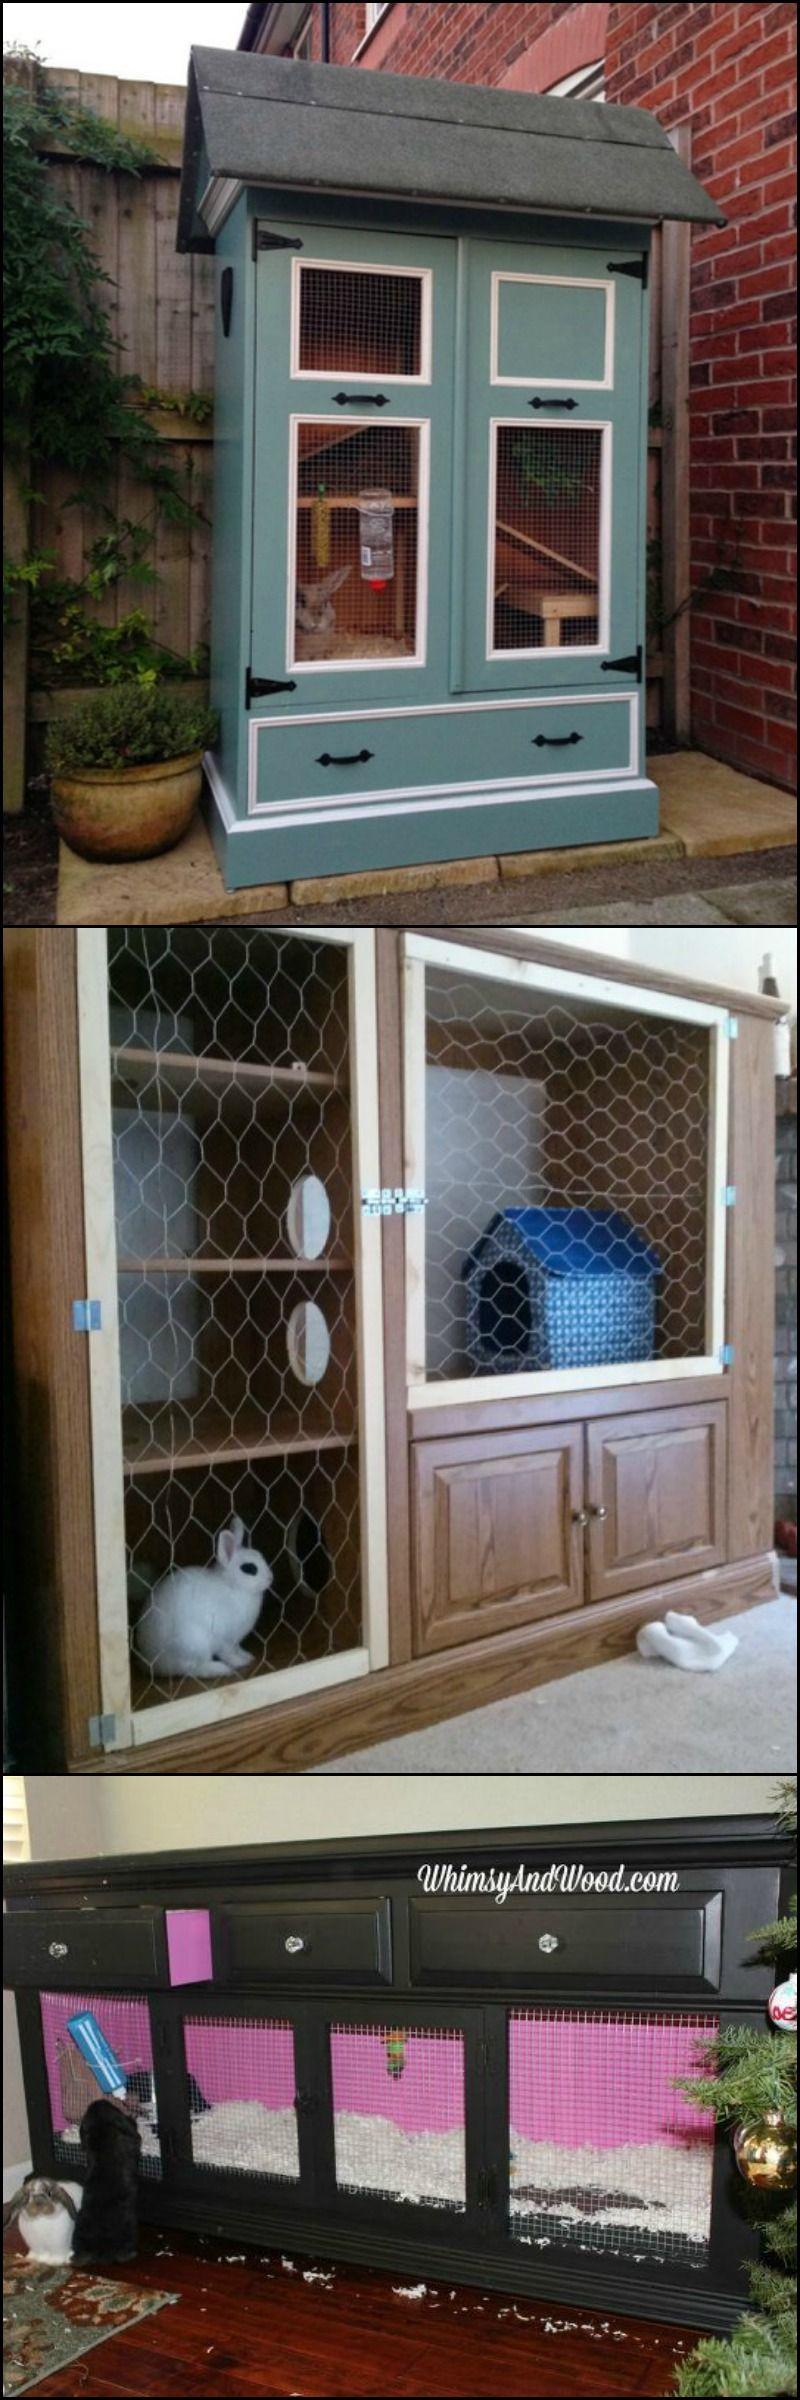 Rabbit hutch ideas made from repurposed furniture ok for Rabbit hutch ideas